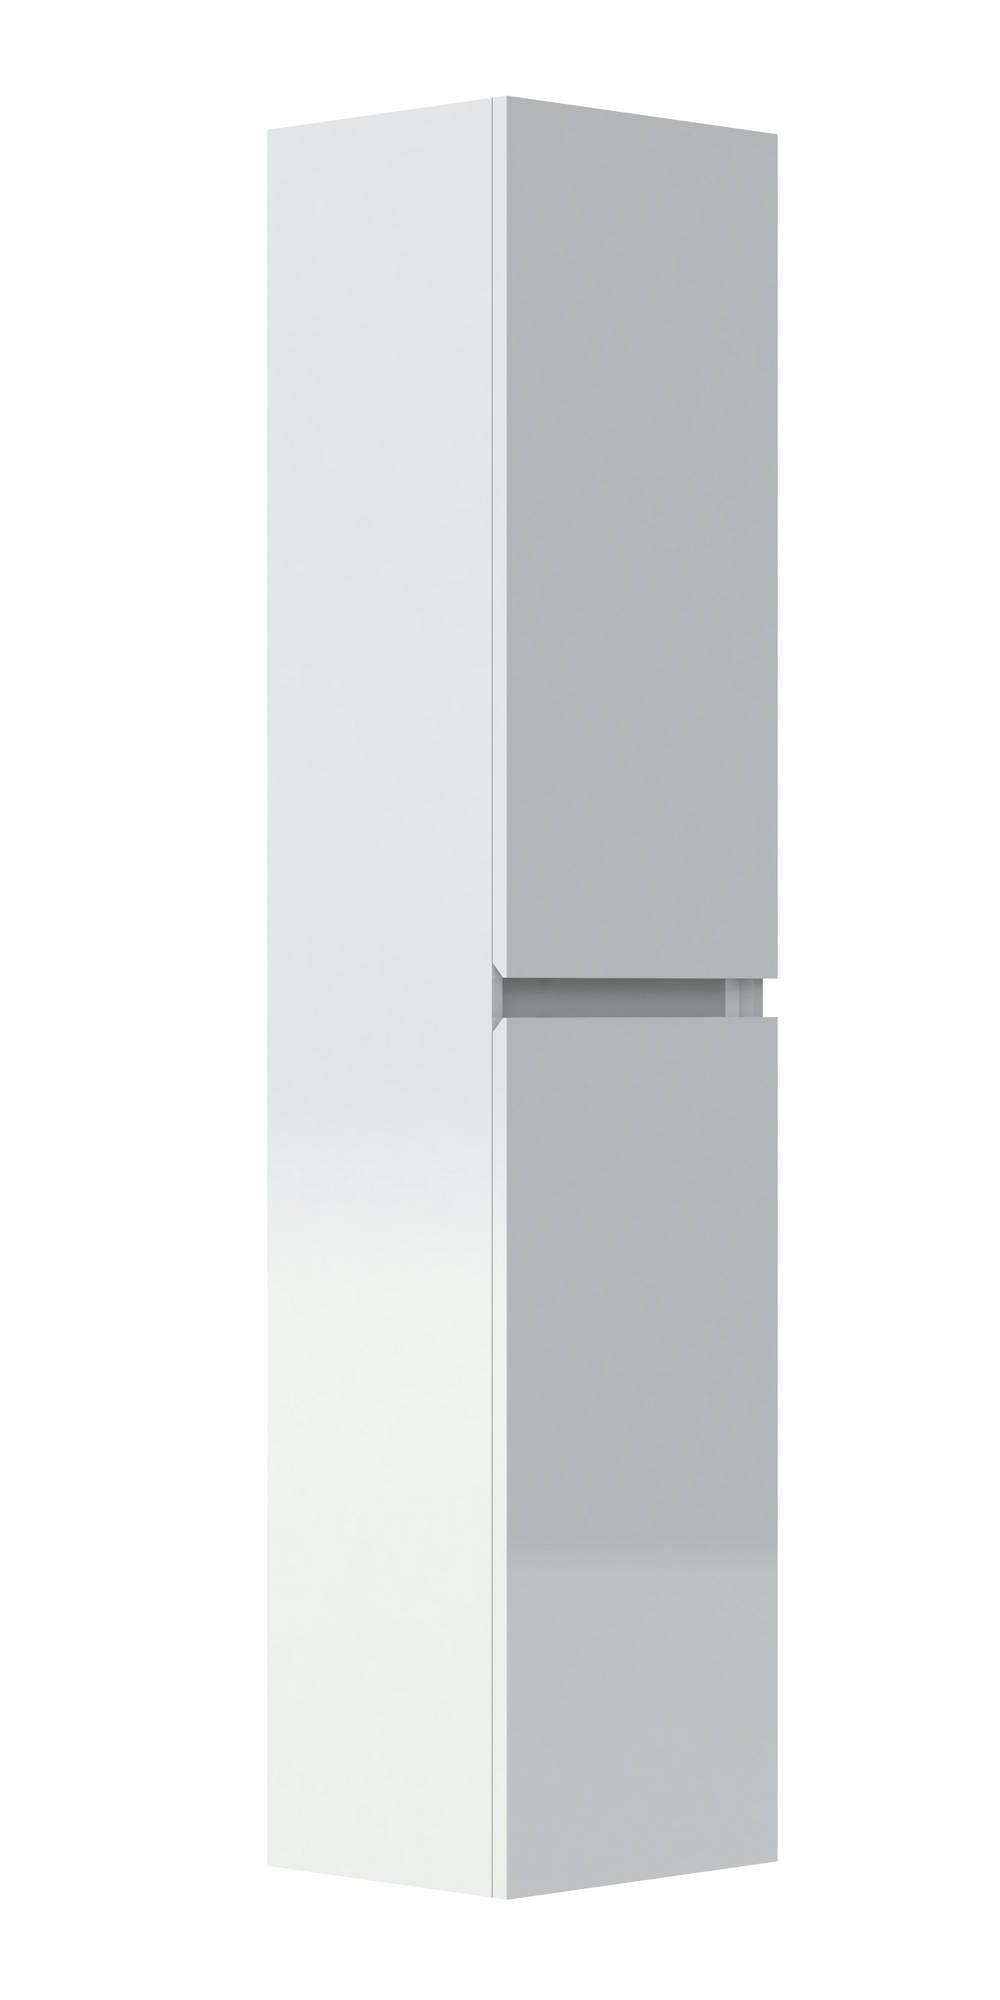 LIVO Kolomkast 40 cm - Glanzend gelakt Wit